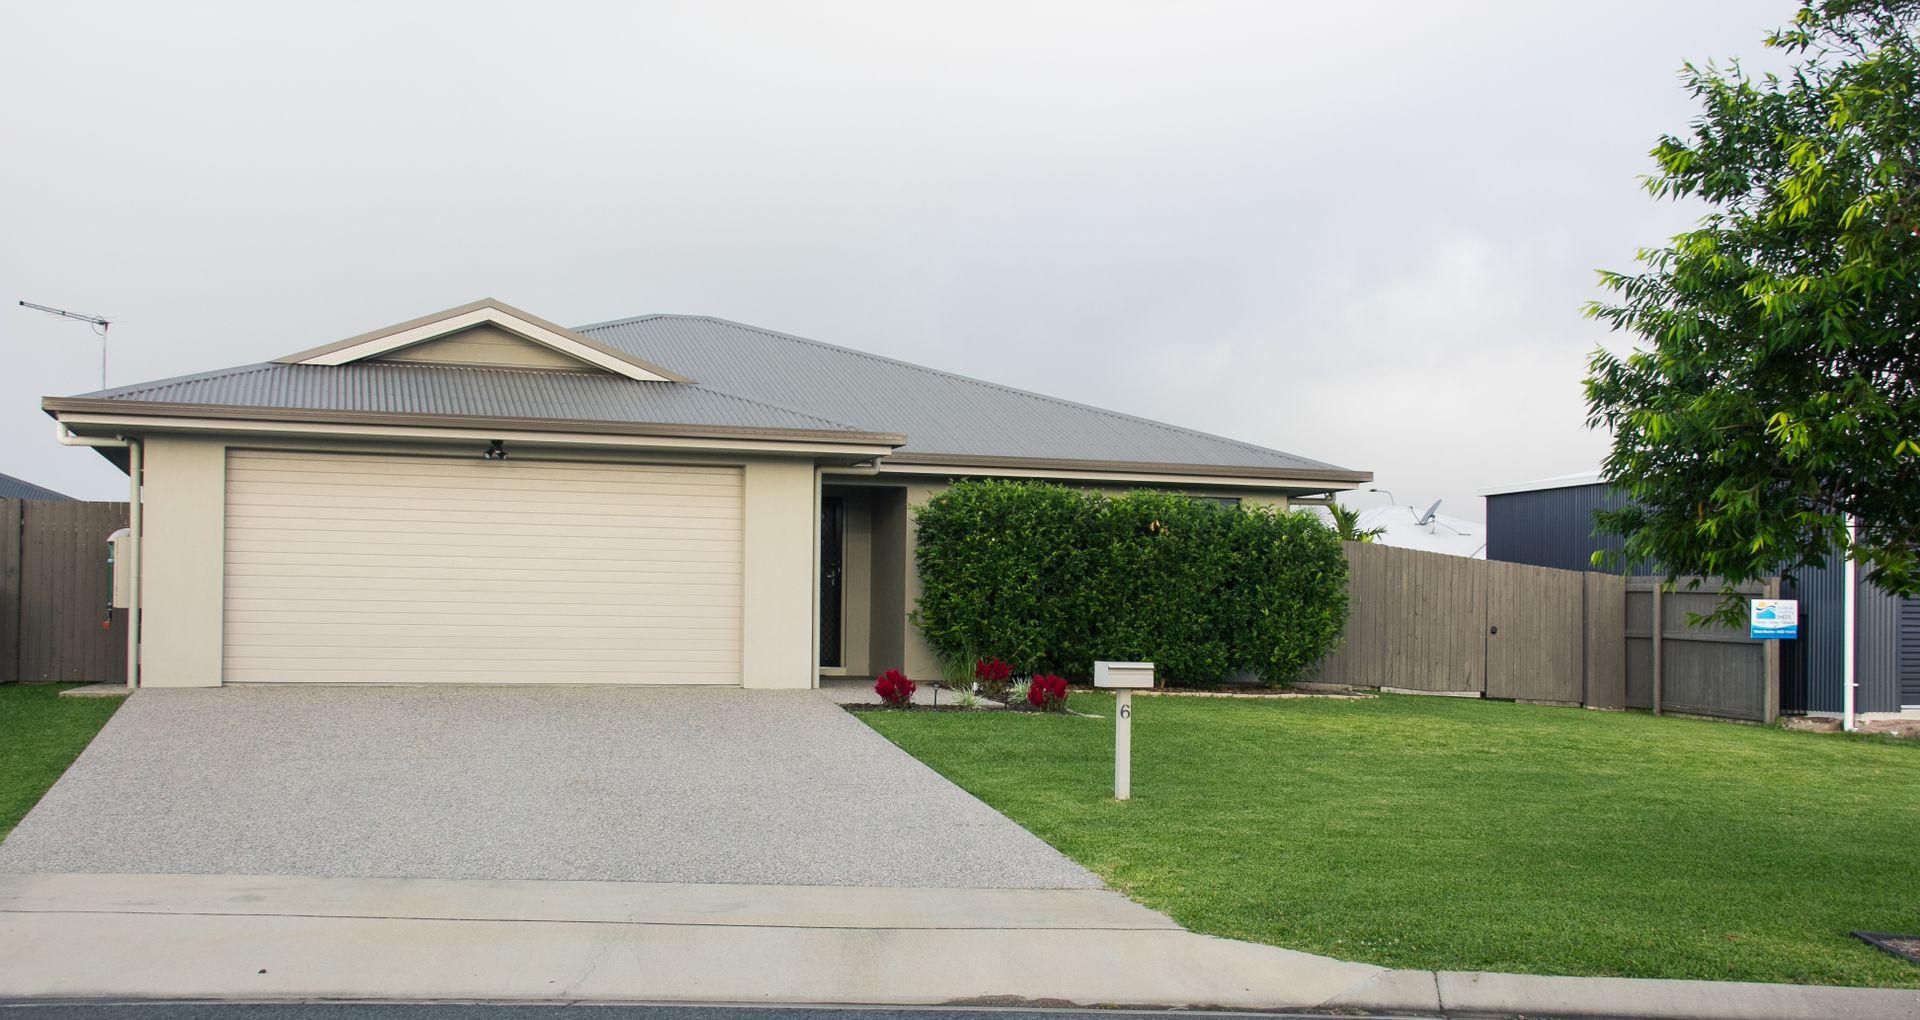 6 Wisteria Avenue, Bakers Creek QLD 4740, Image 0